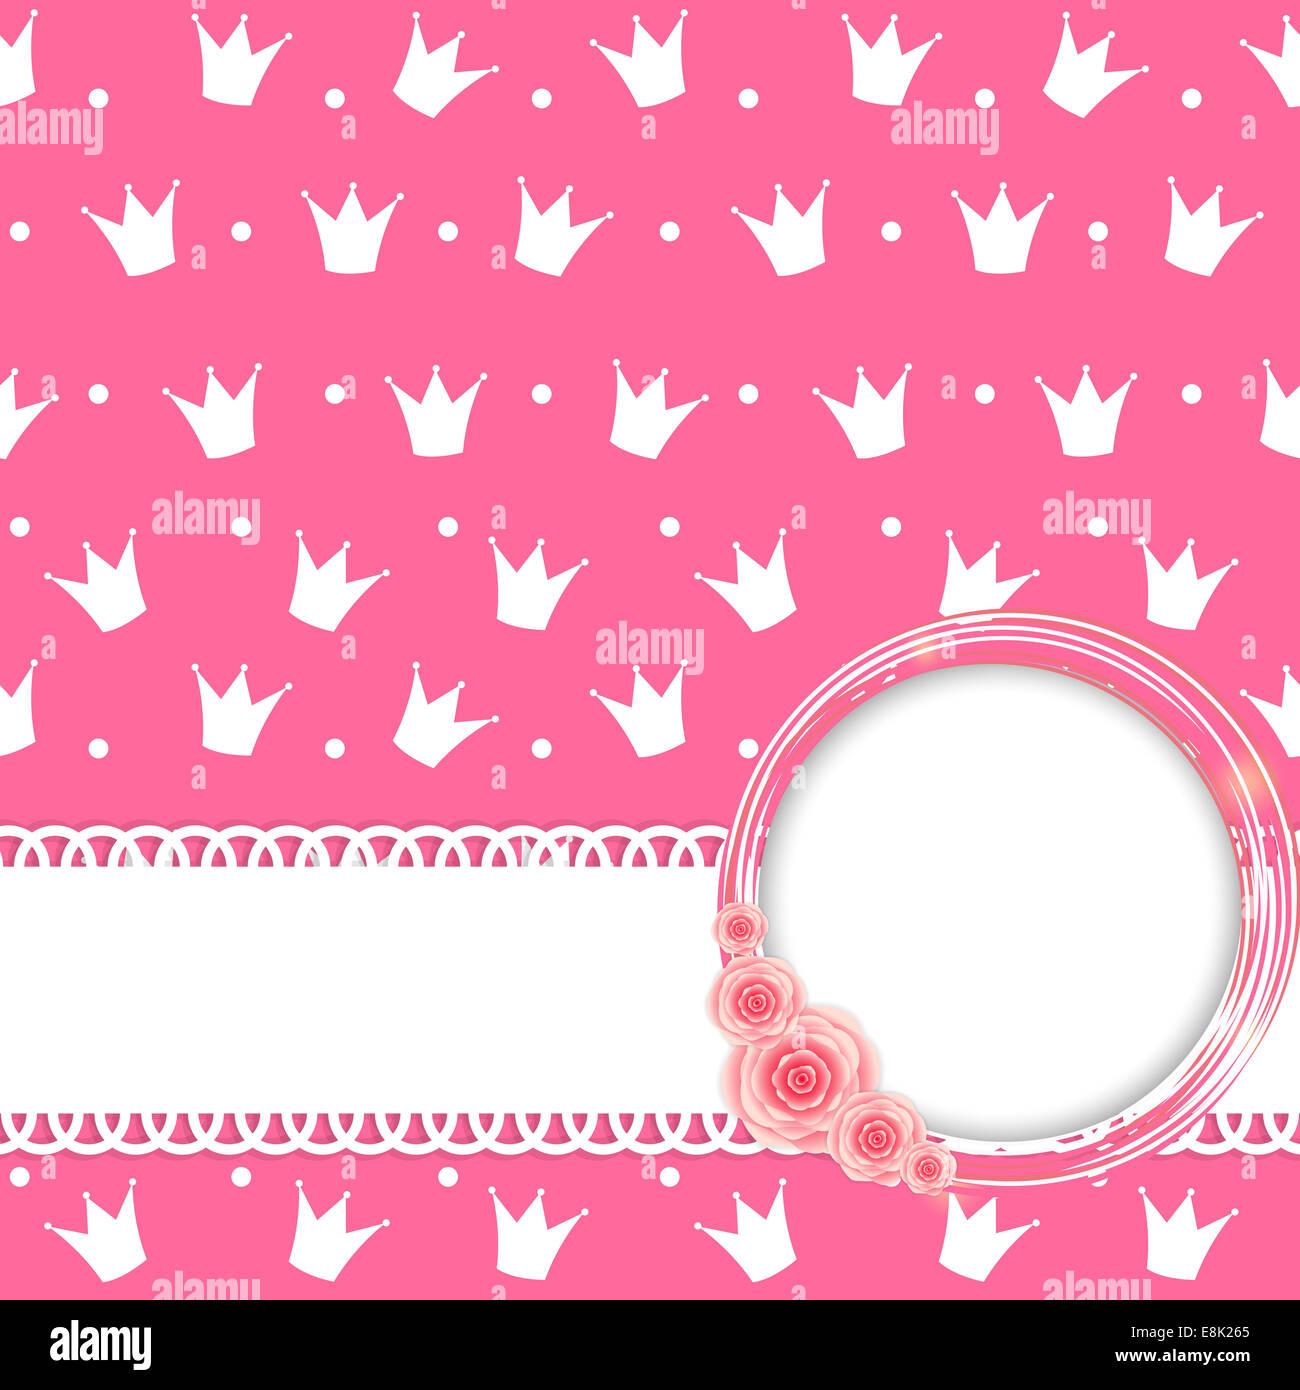 Pink Princess Crown Background Vector Illustration Eps10 Stock